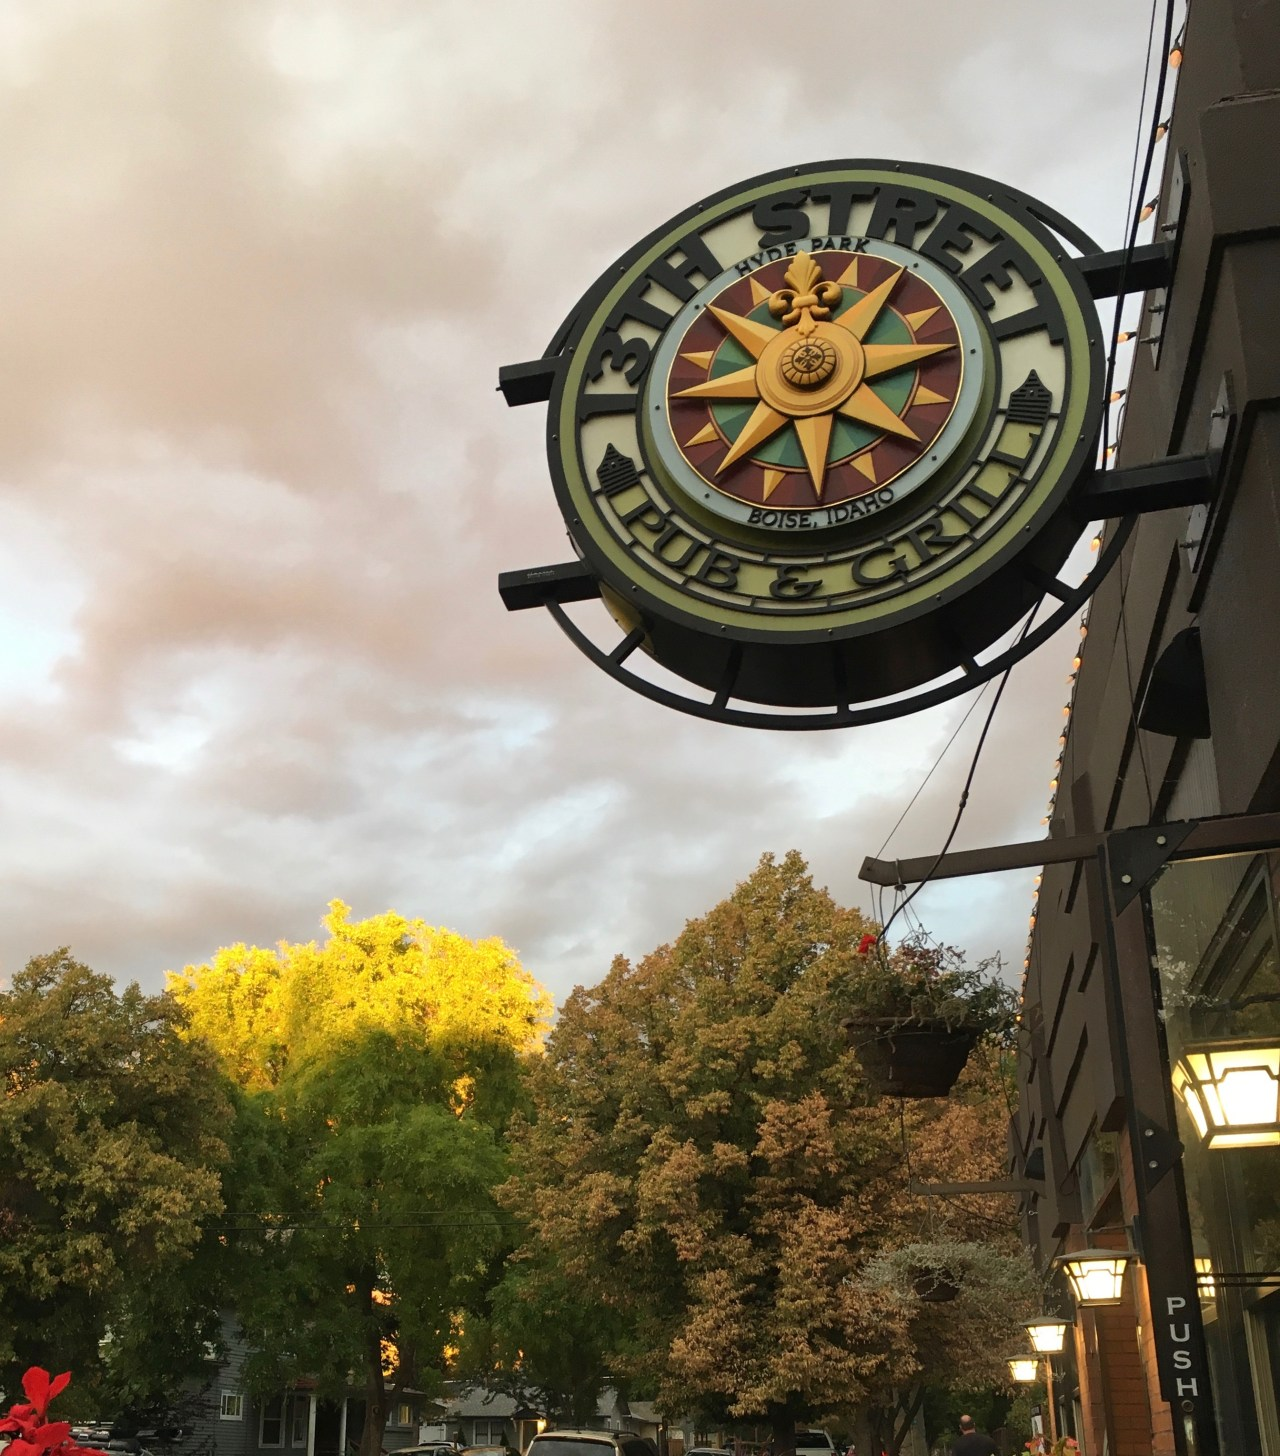 13th Street Pub and Grill. Boise, Idaho